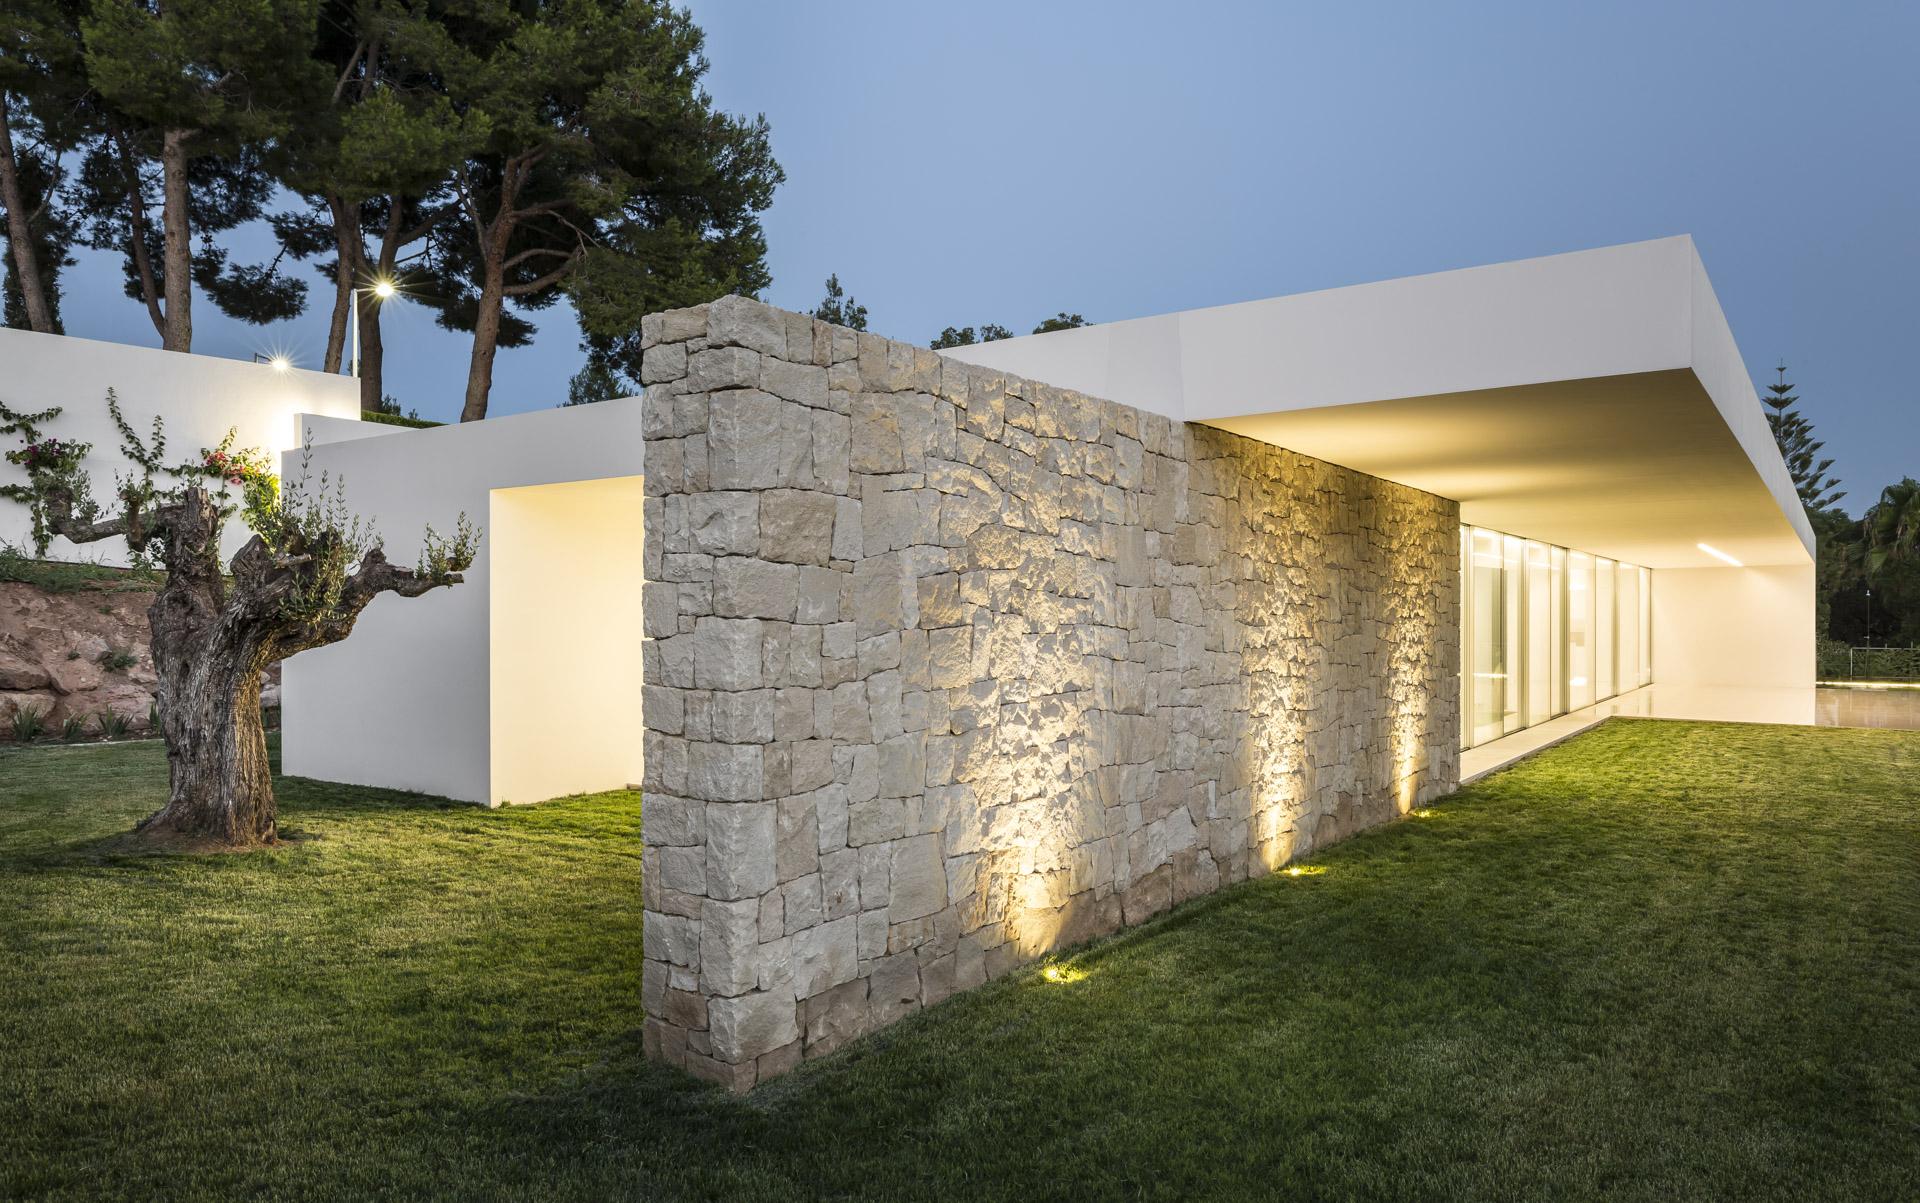 fotografia-arquitectura-valencia-german-cabo-gallardo-llopis-villamarchante-vivienda-59